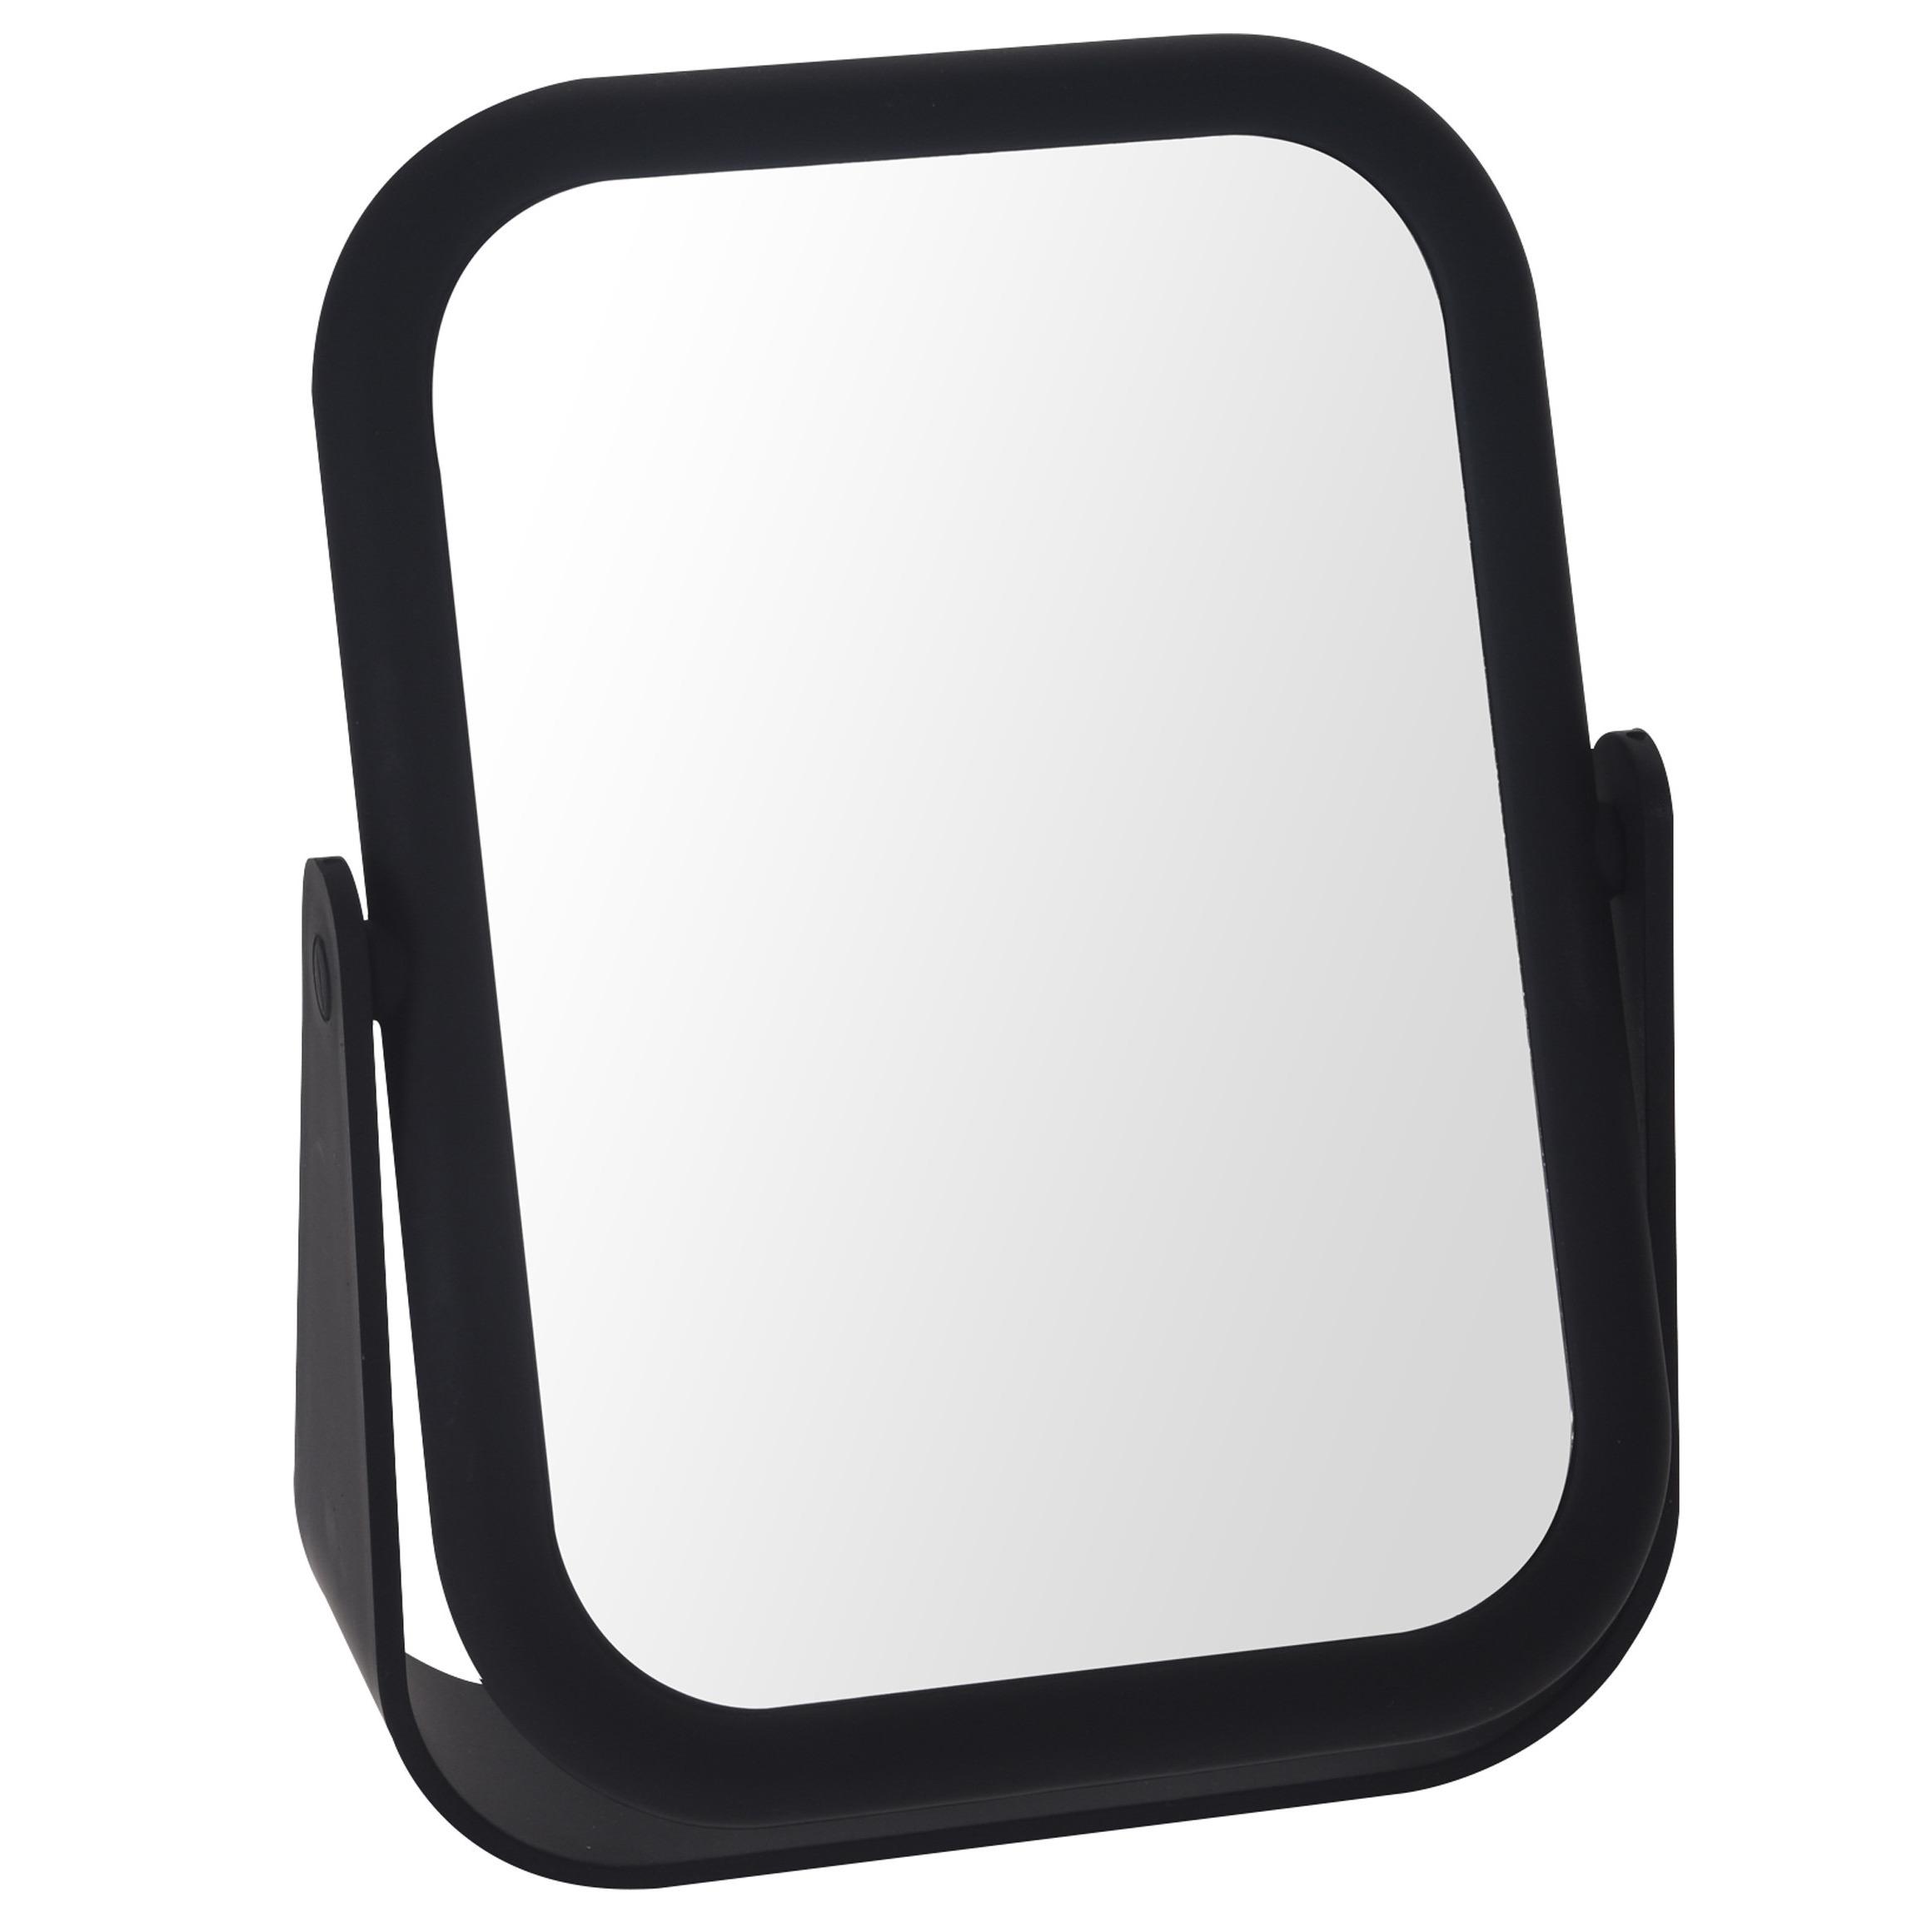 Zwarte make up spiegel rechthoek dubbelzijdig 15 x 21 cm